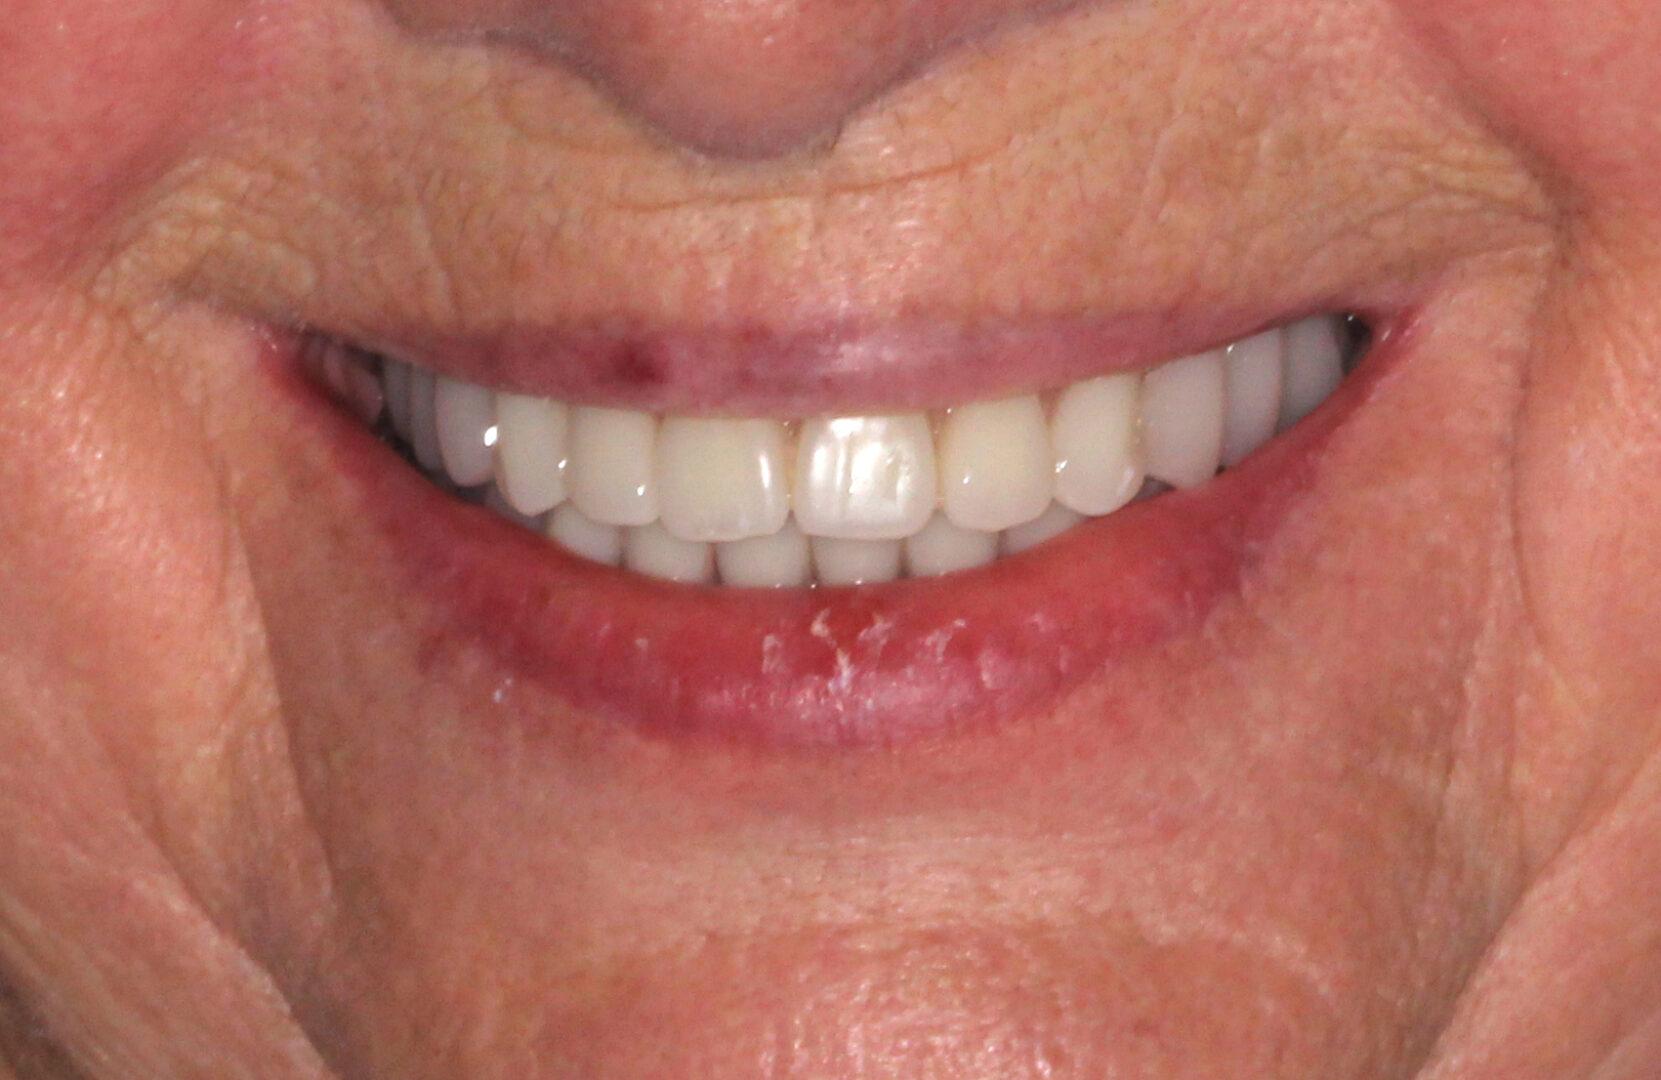 After applying restorations and dentures